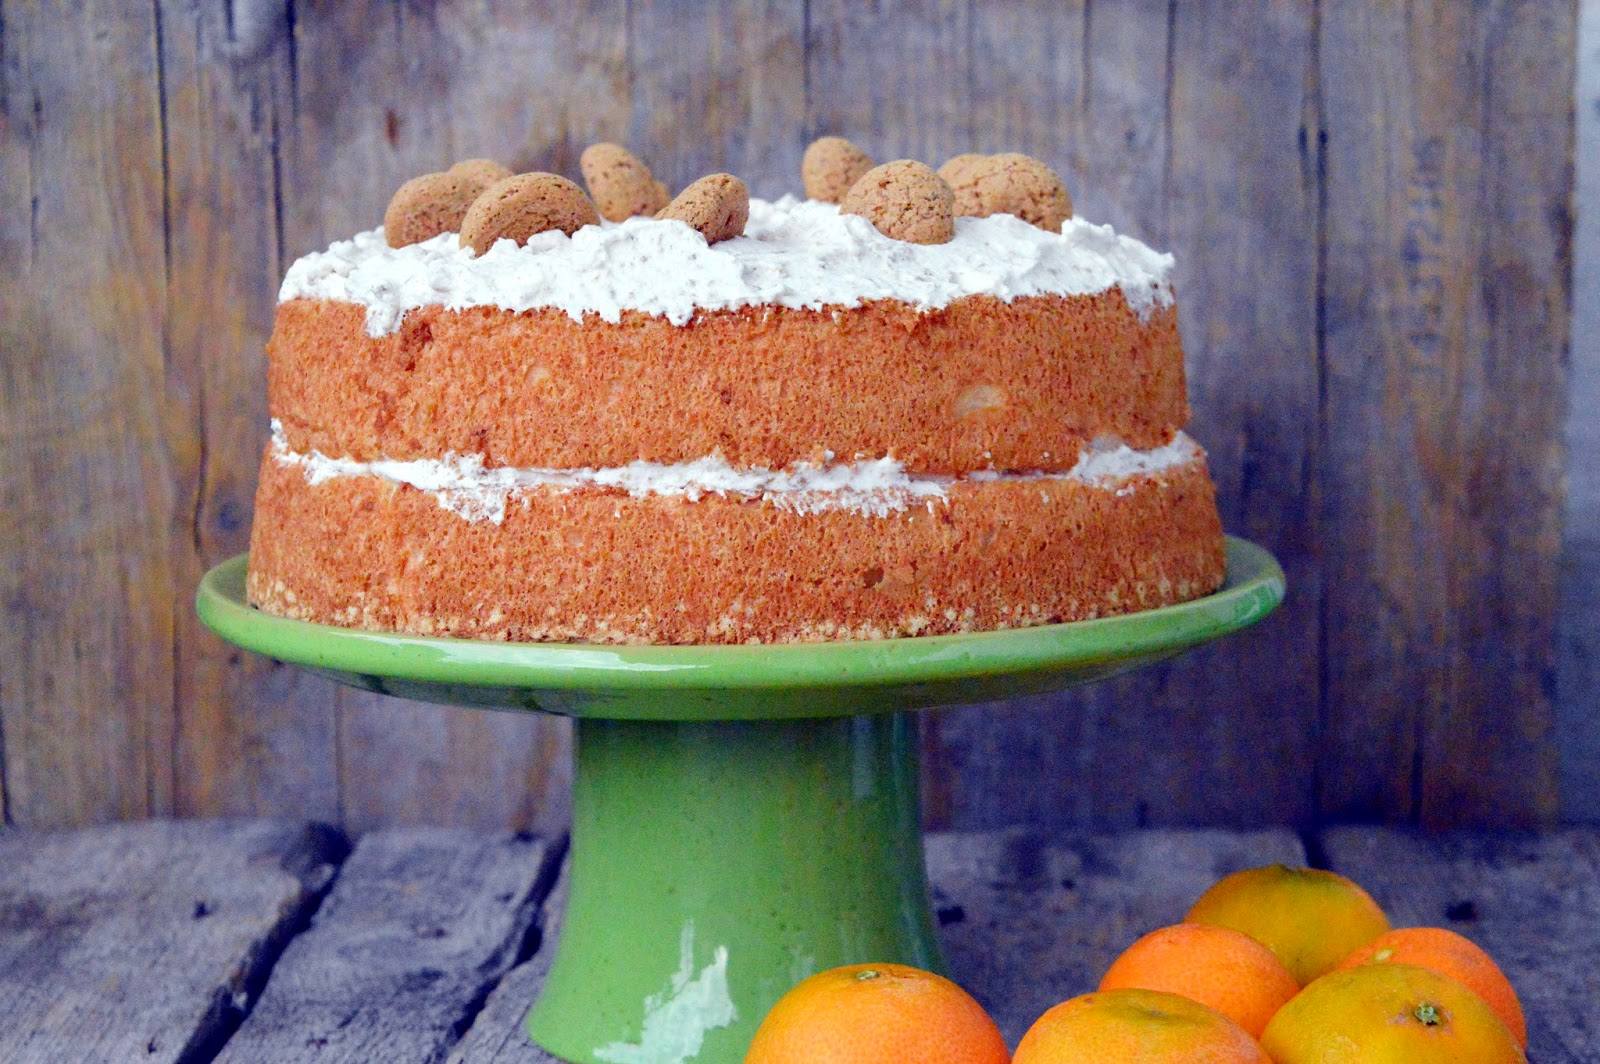 Angel cake all'amaretto e mandarino